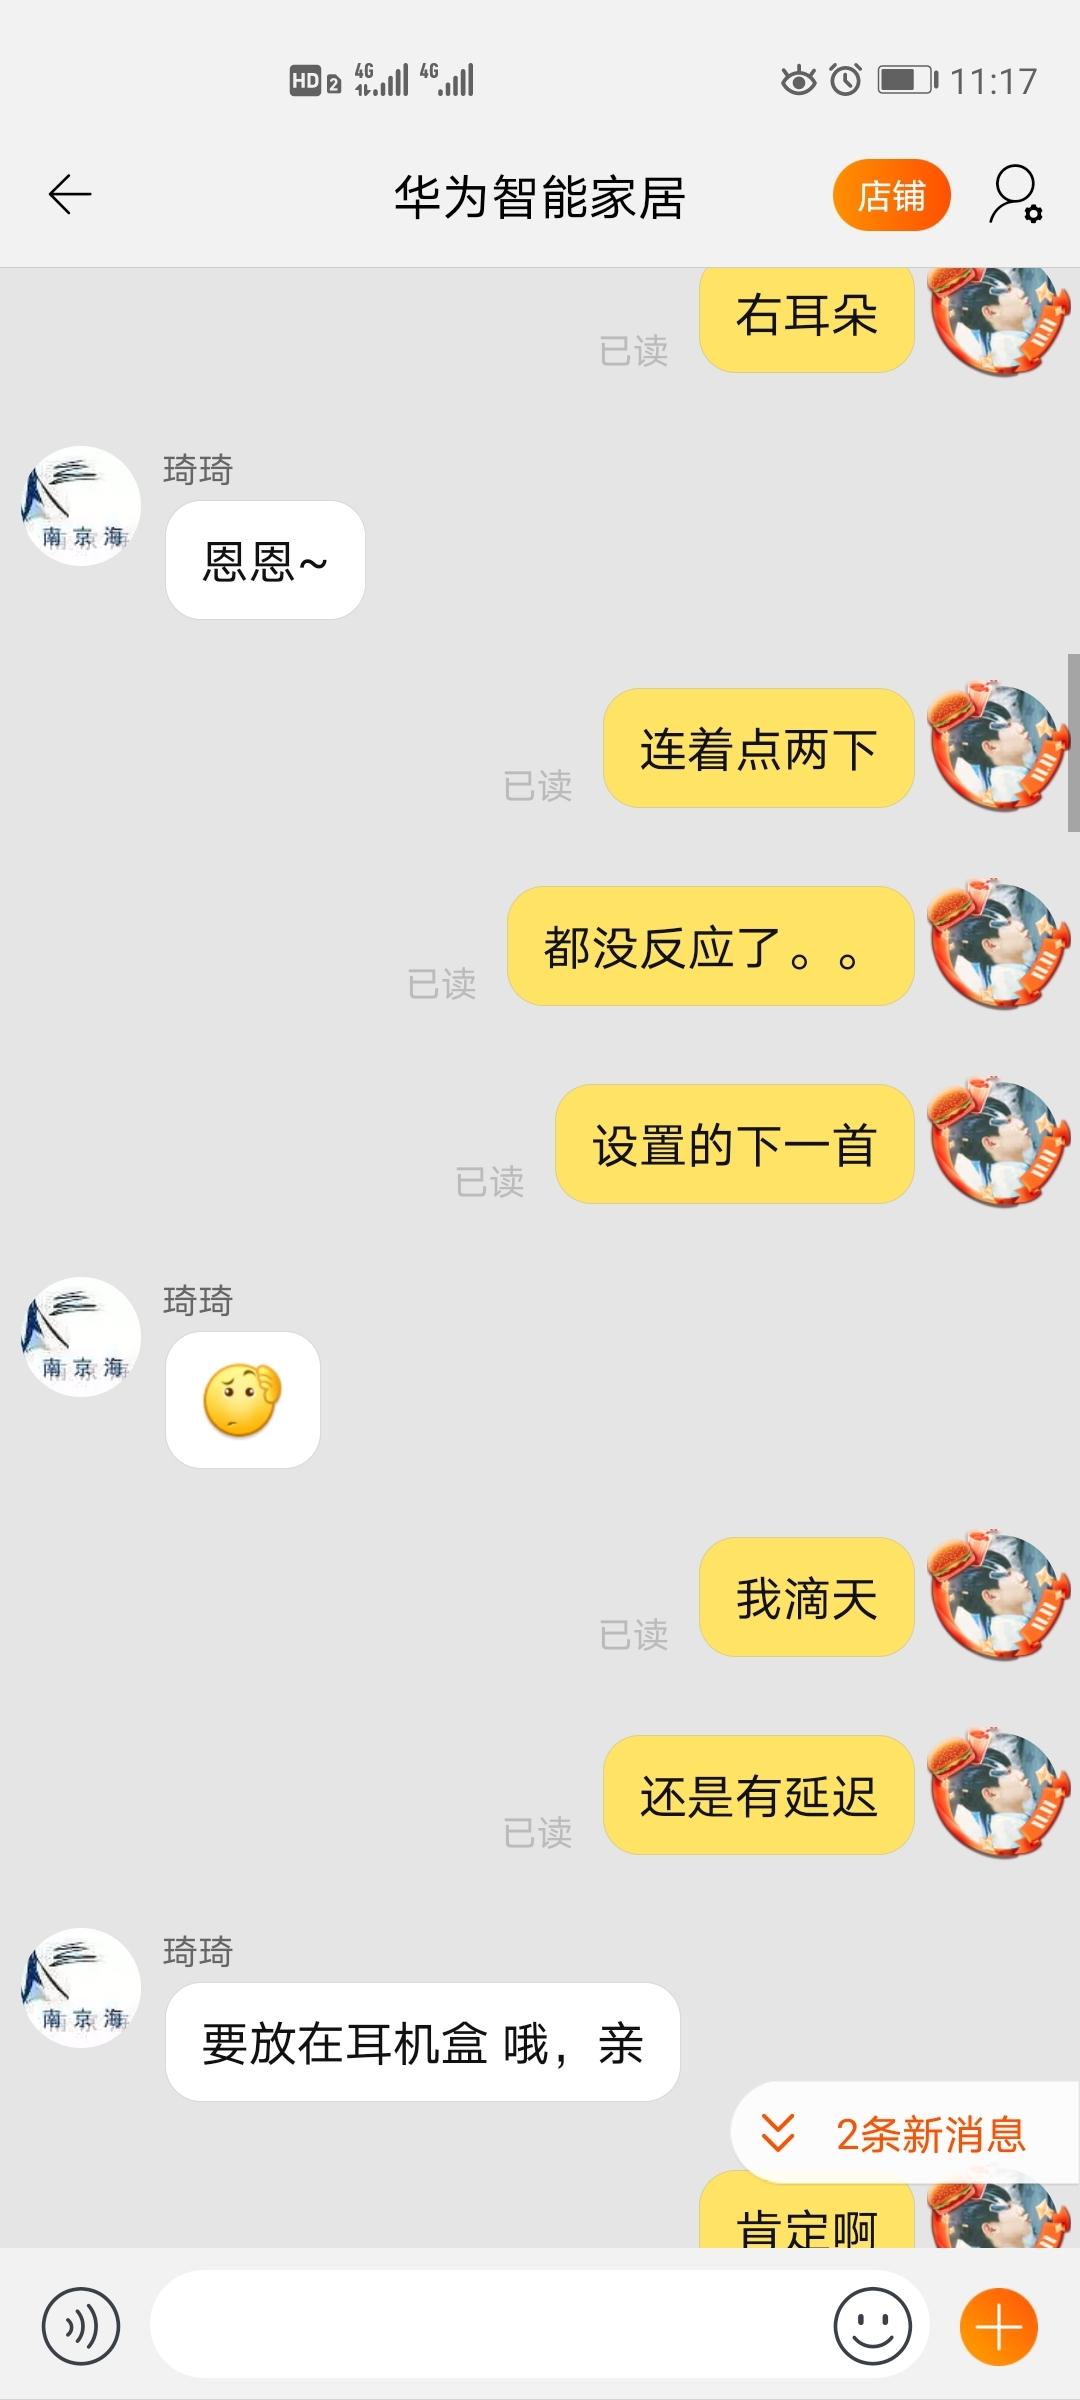 Screenshot_20200508_111700_com.taobao.taobao.jpg